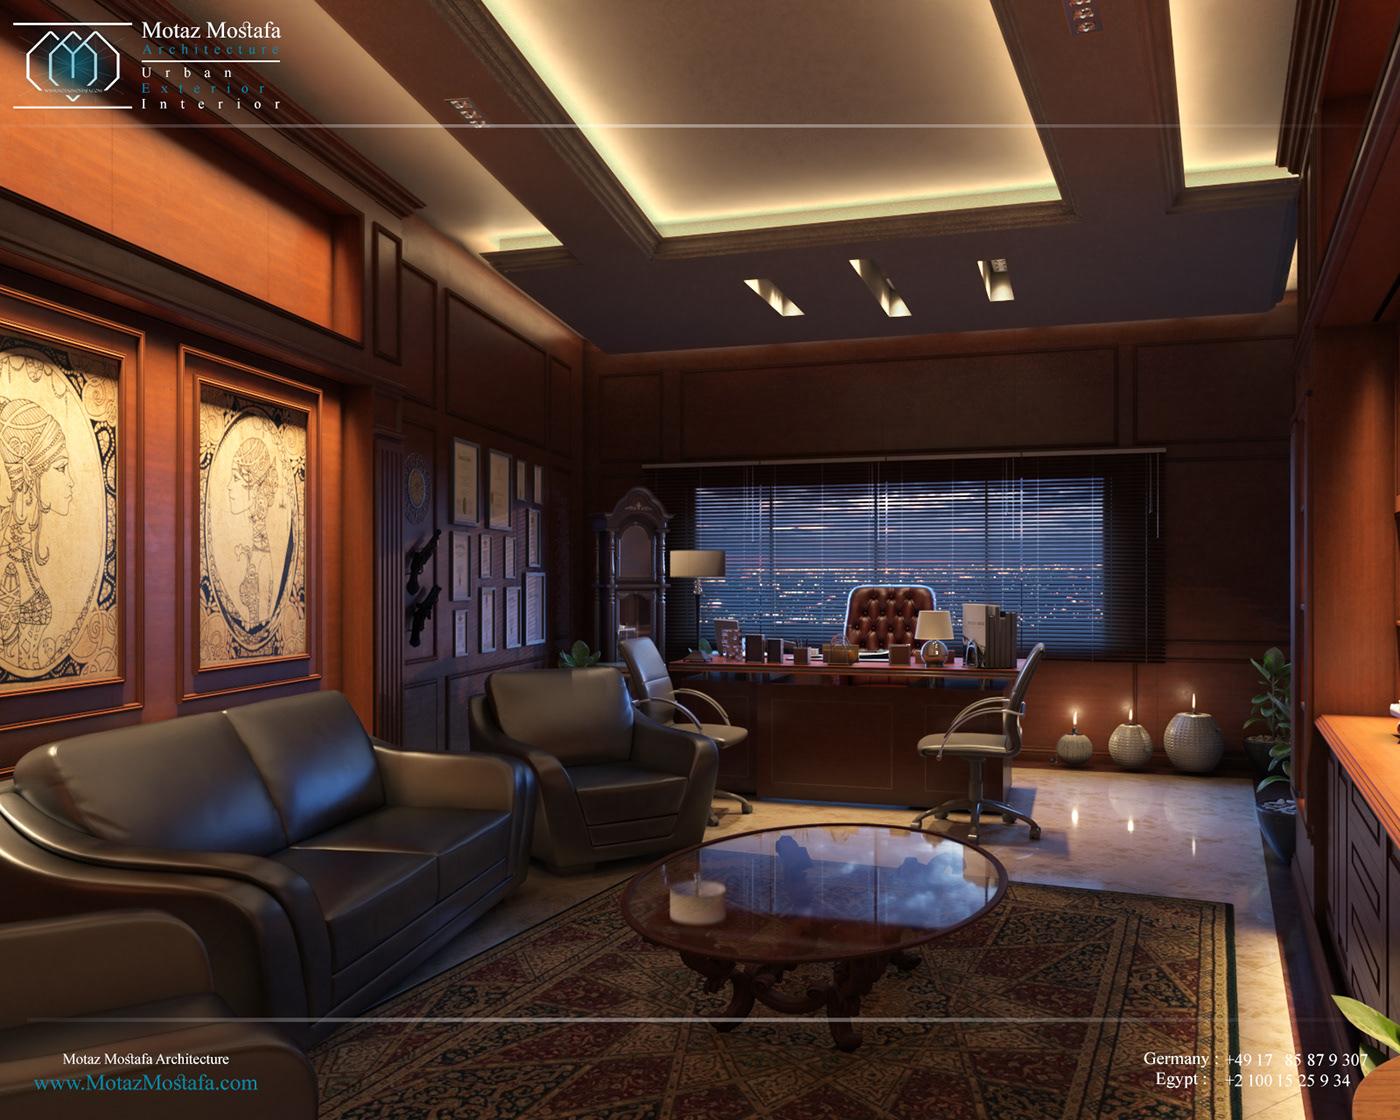 architecture interior design  Interior design creative decor graphics art Style Motaz mostafa